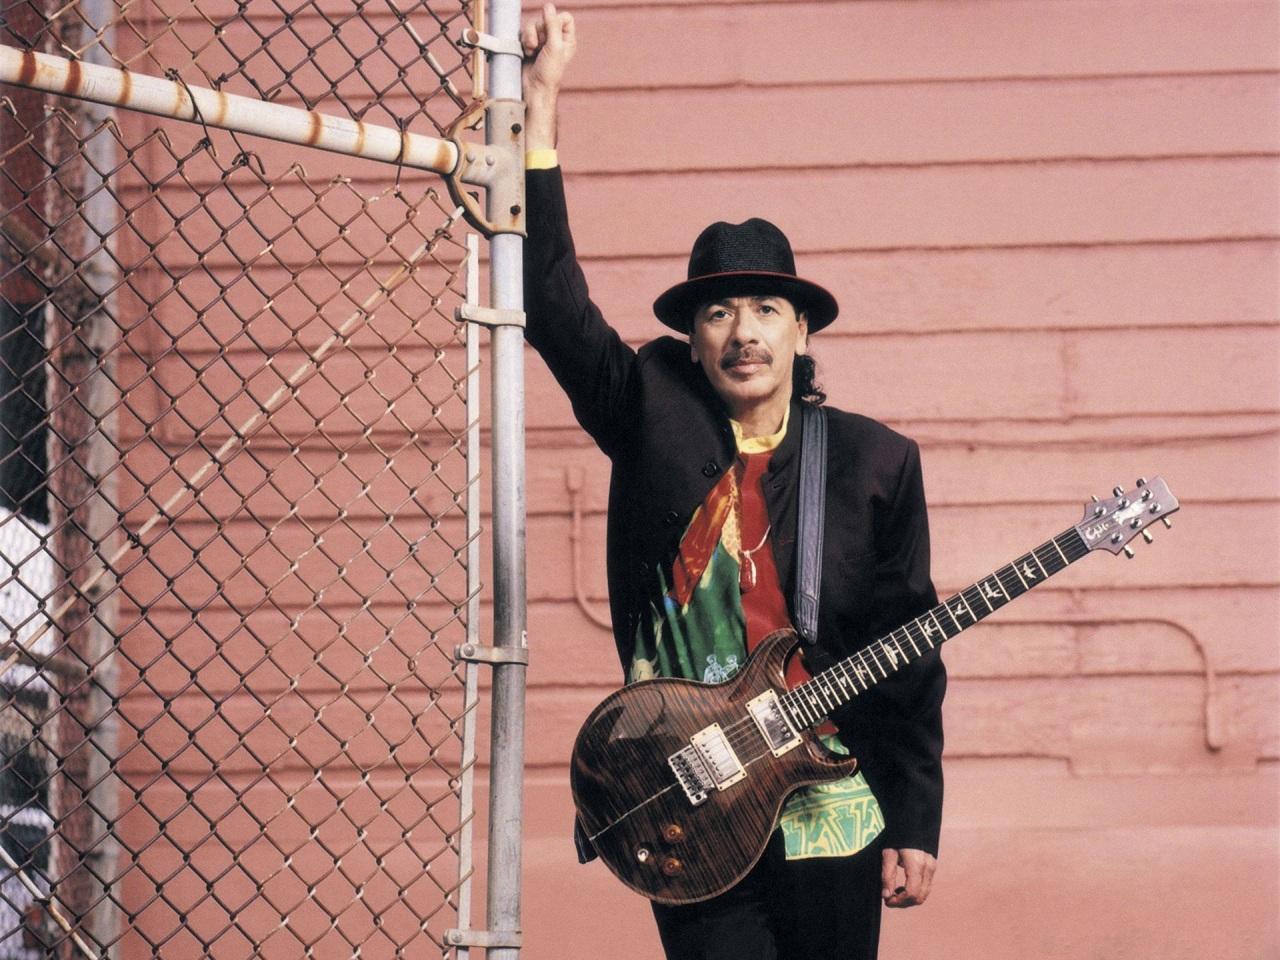 Carlos Santana Wallpaper Photo Shared By Georgine44 Fans Share 1280x960